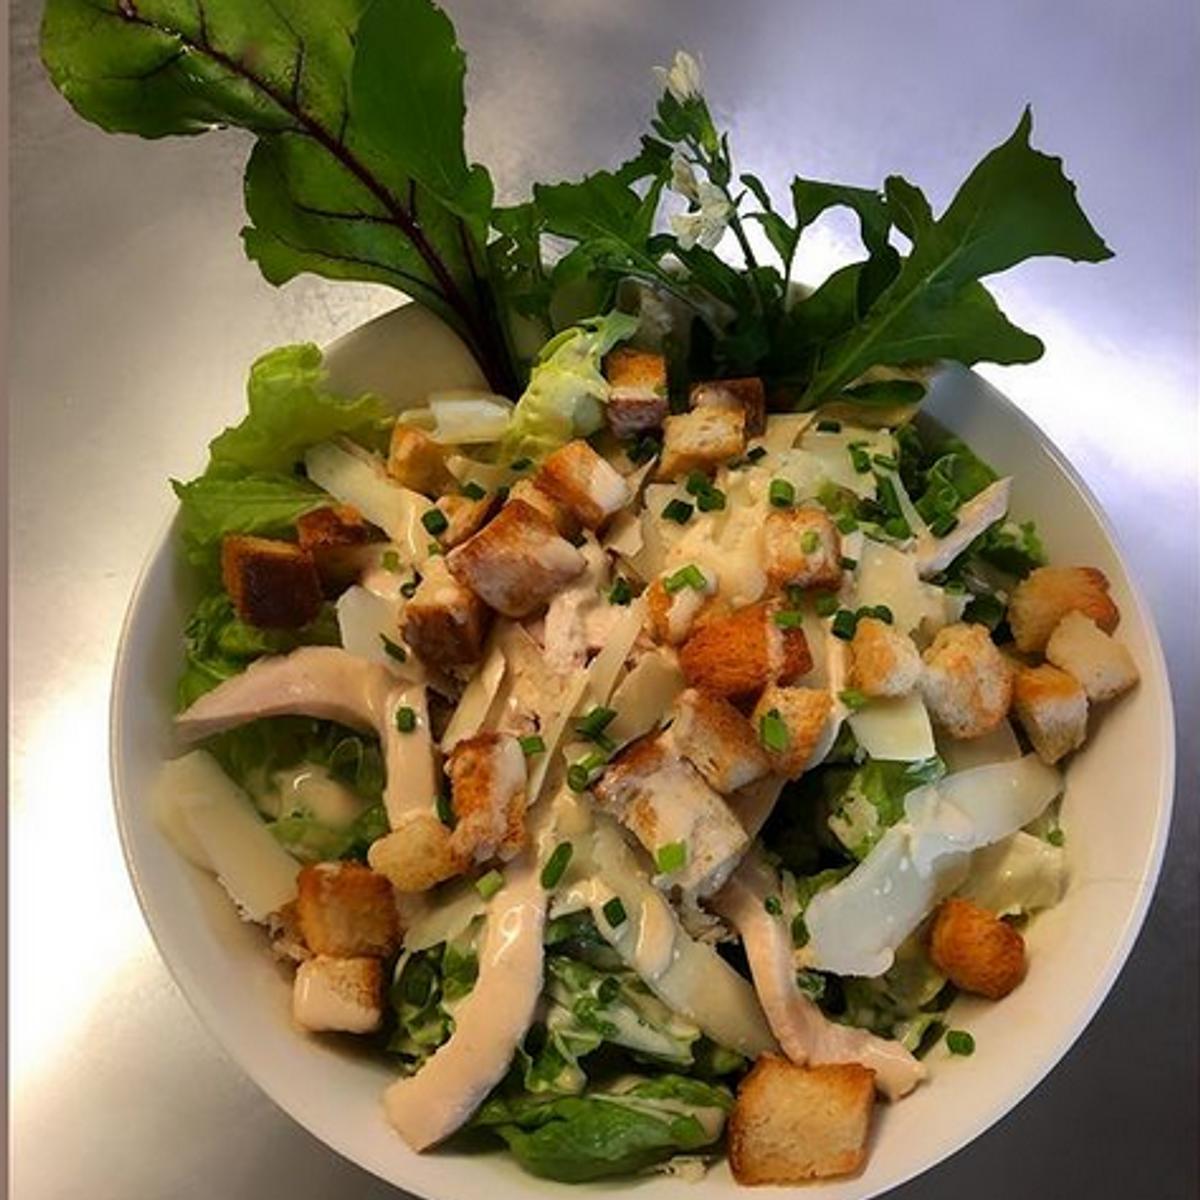 Salade césar des U.S.A